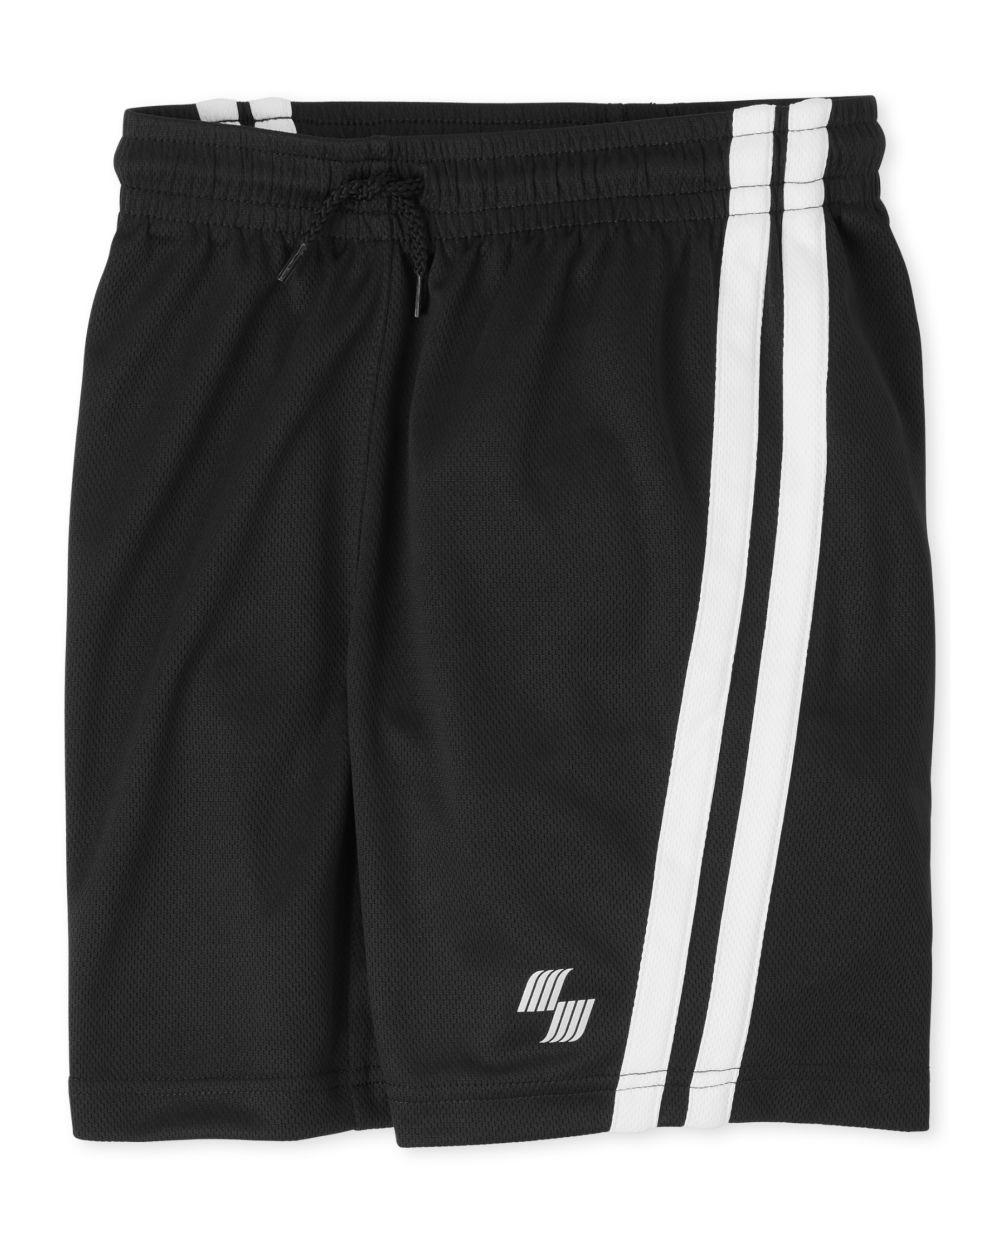 Boys Mix And Match Side Stripe Performance Basketball Shorts